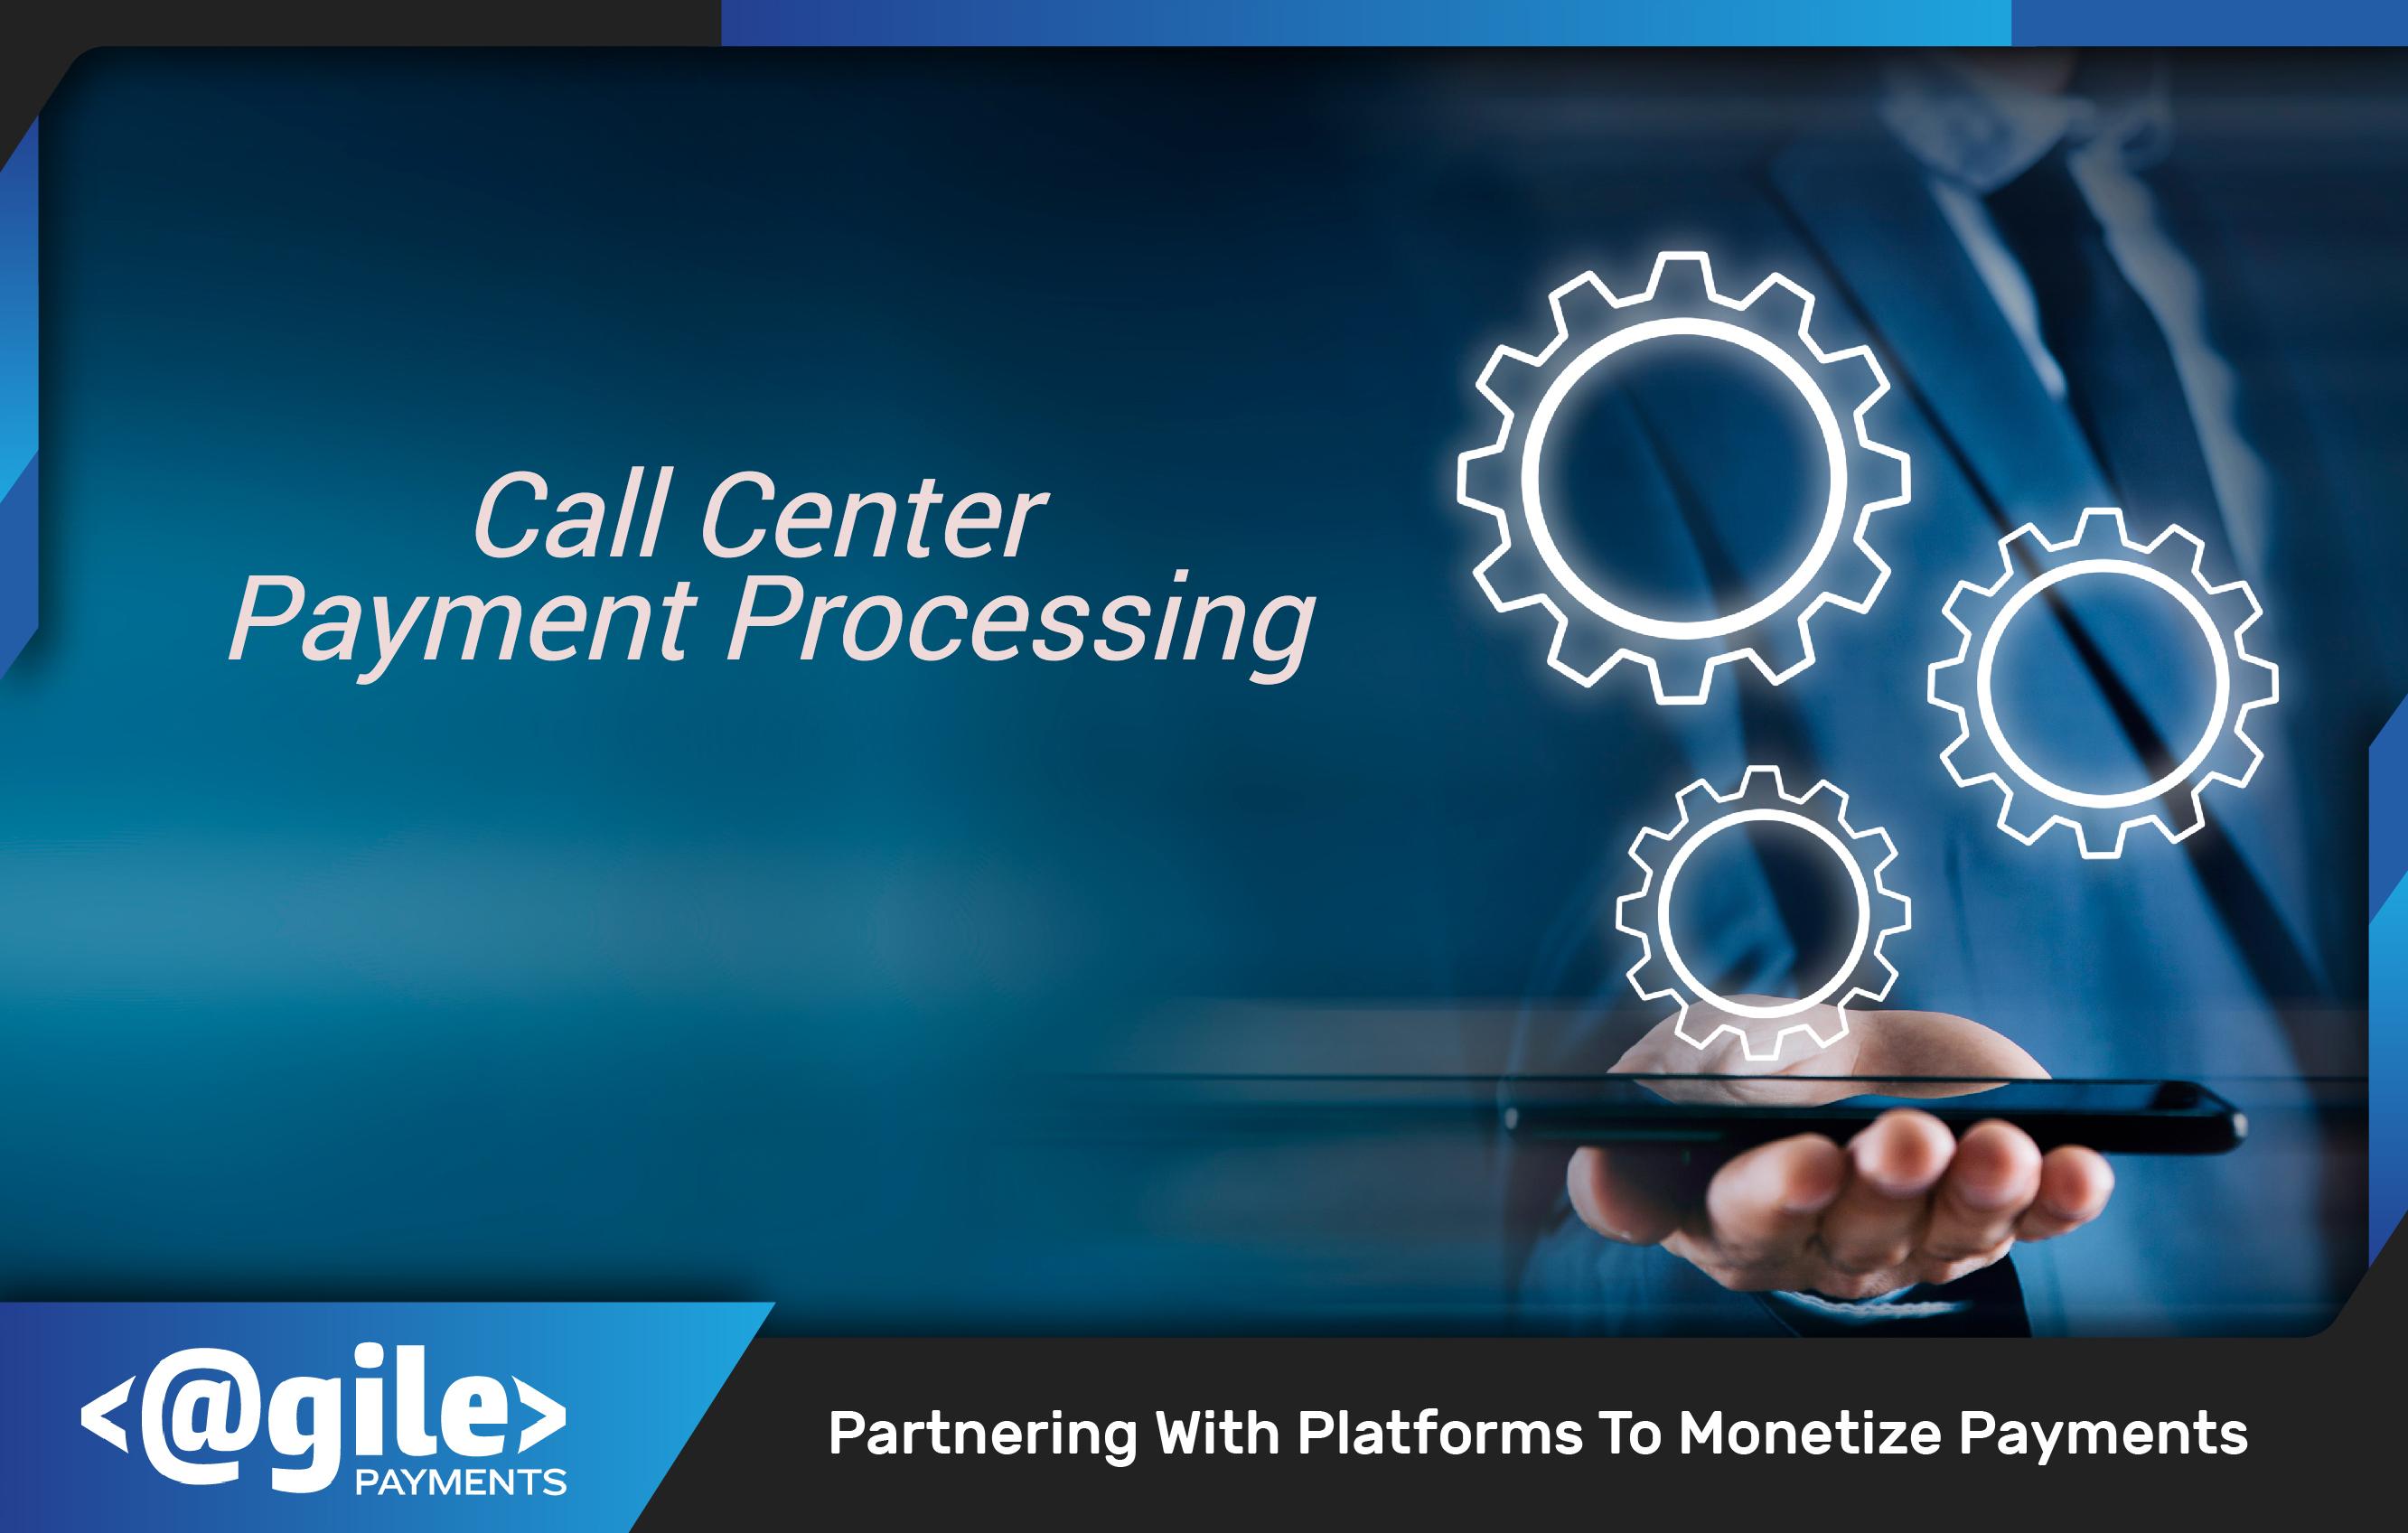 call cnter payment processing